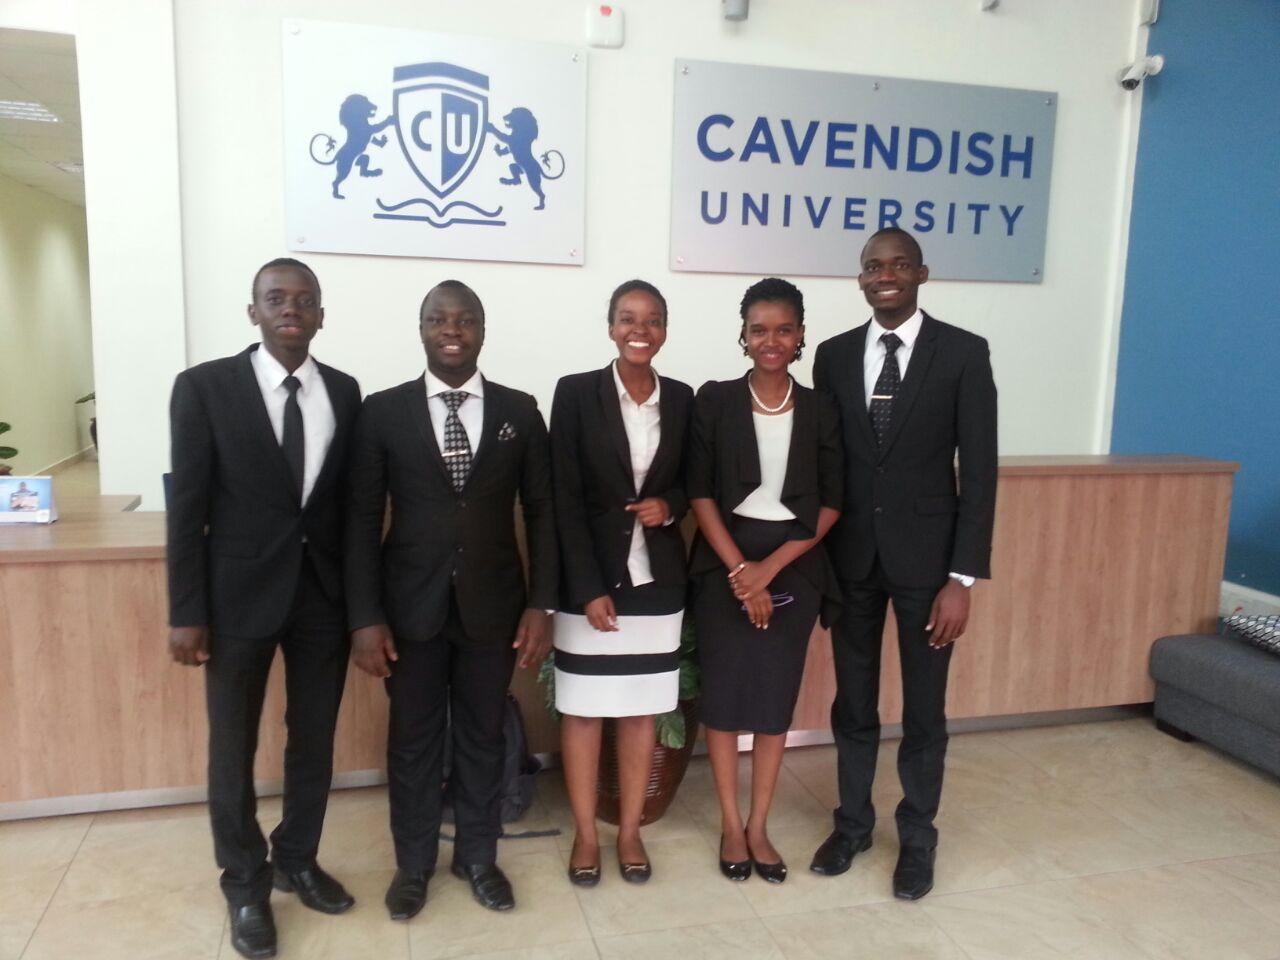 UCU TEAM: Pius Kitamirike, Kalondo Paul, Banya Trisha, Twongyeirwe Isabel and Okia Joseph